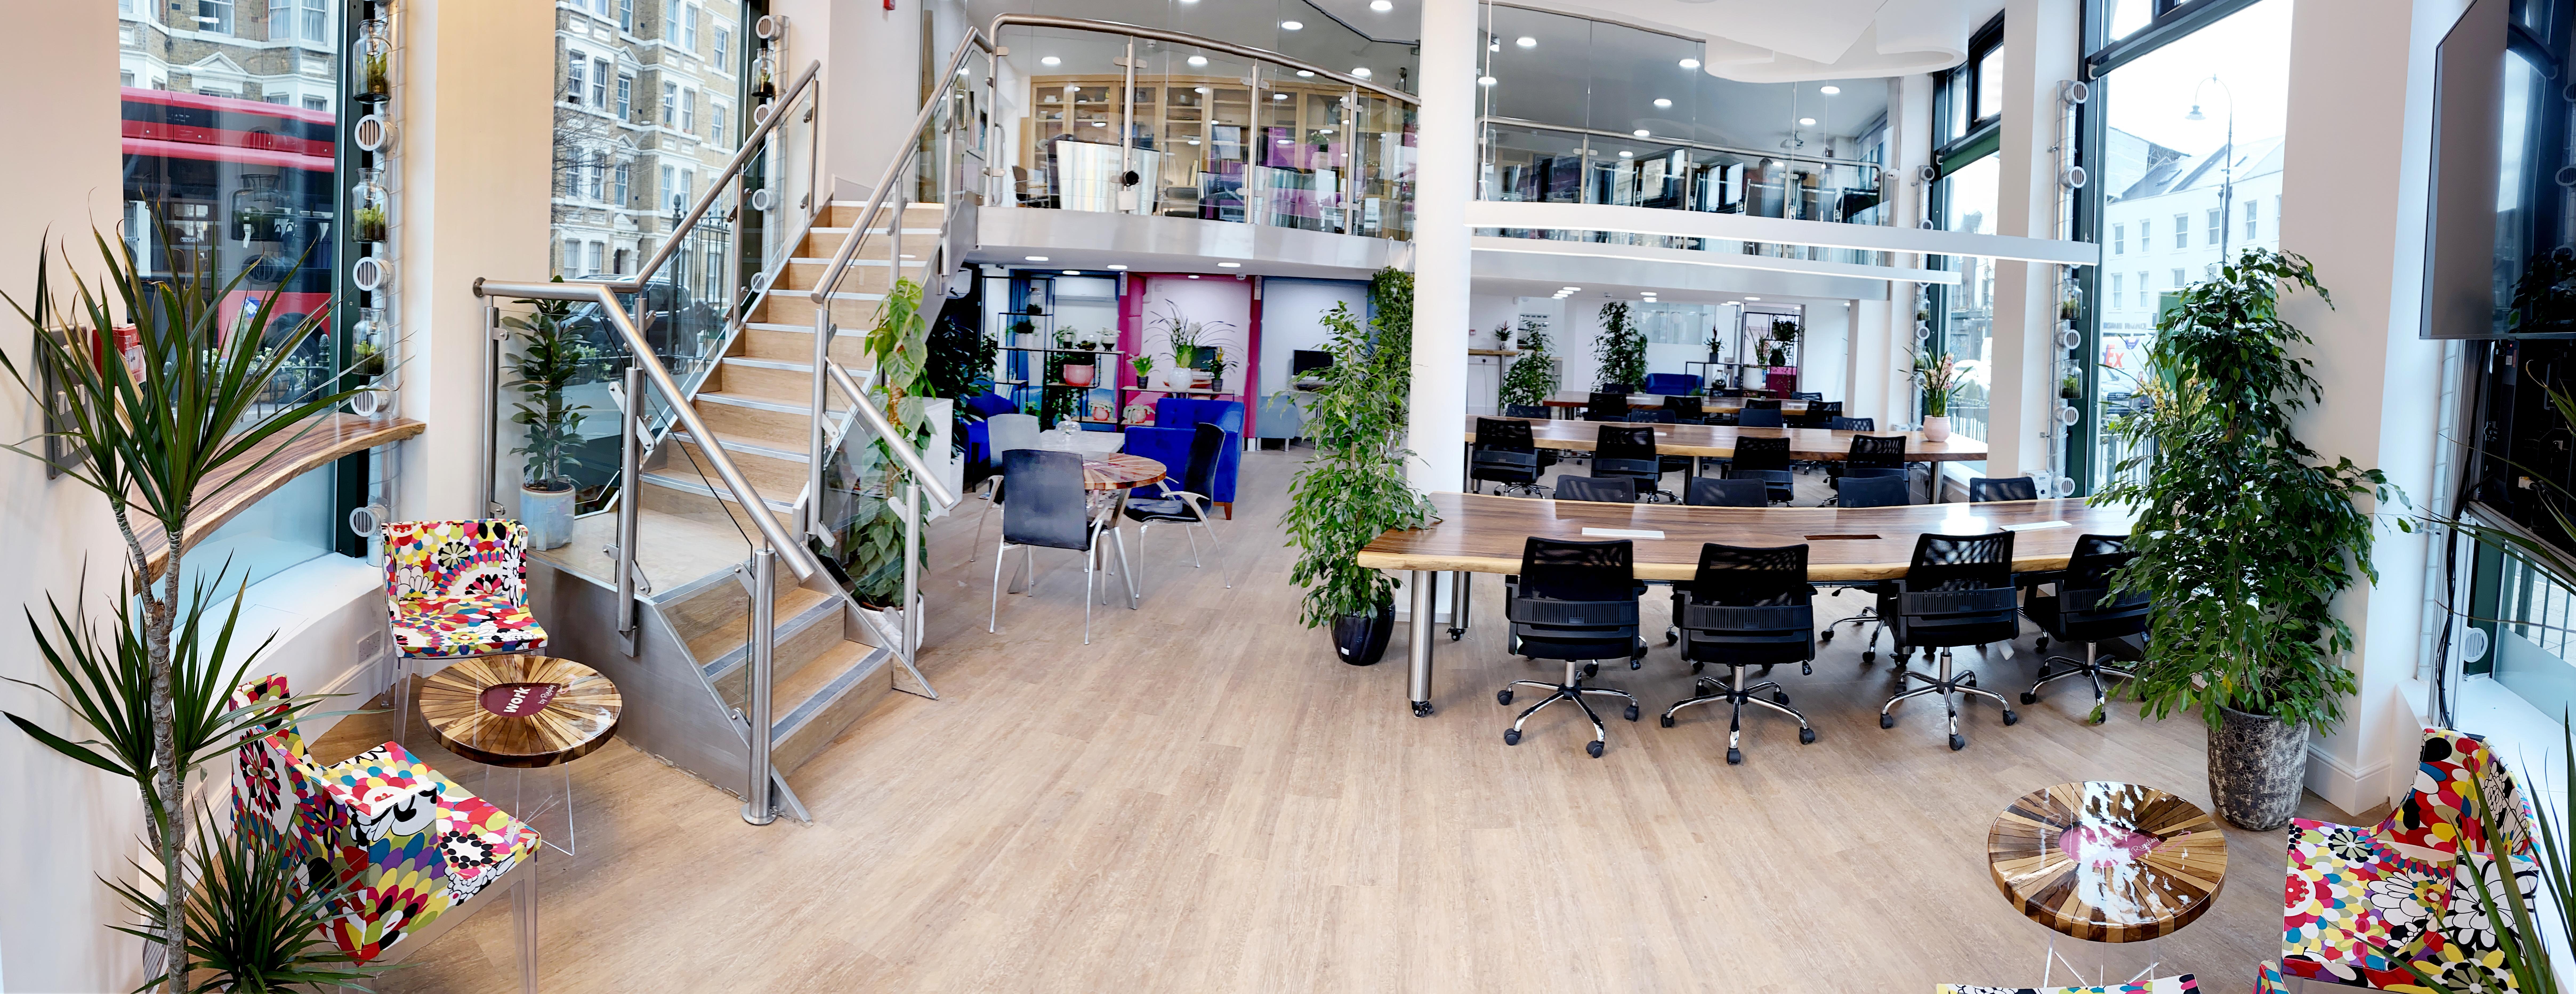 Camden Gateway hot desk space